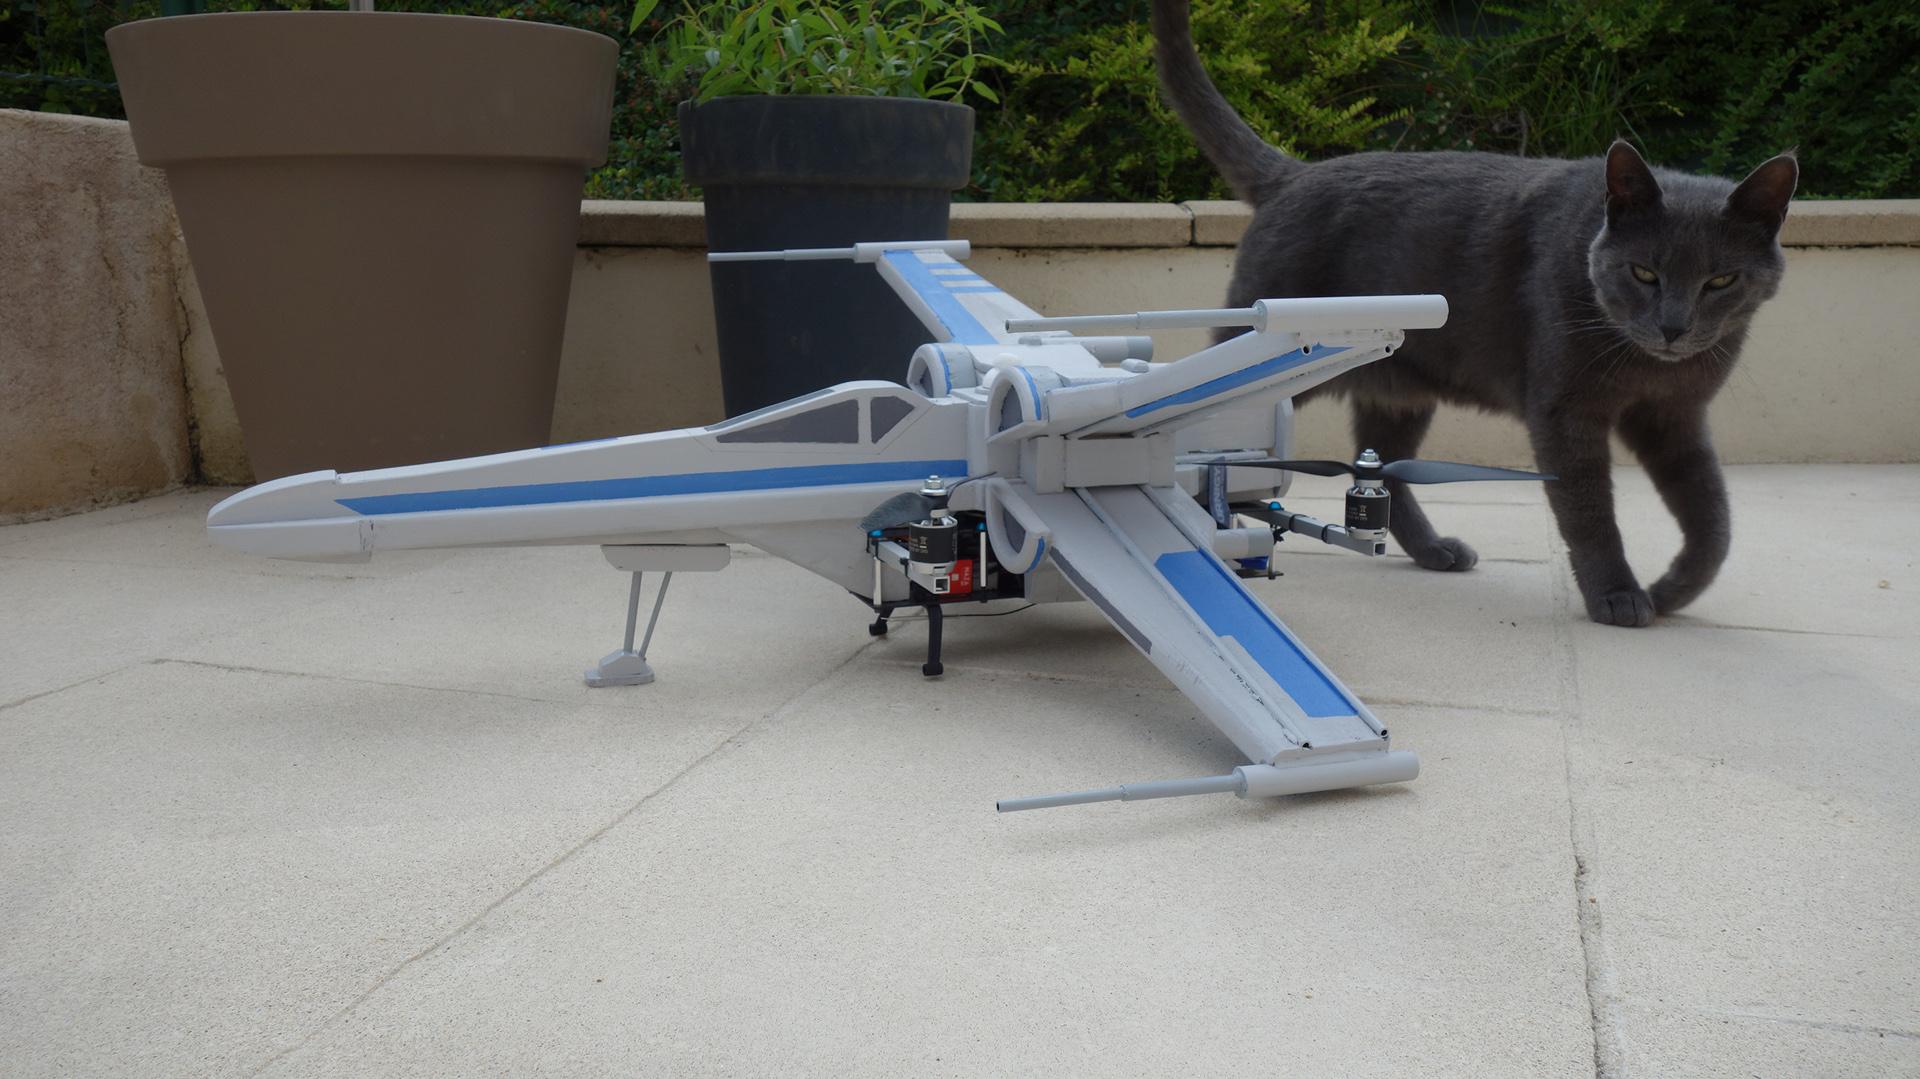 tie fighter drone photo - 1